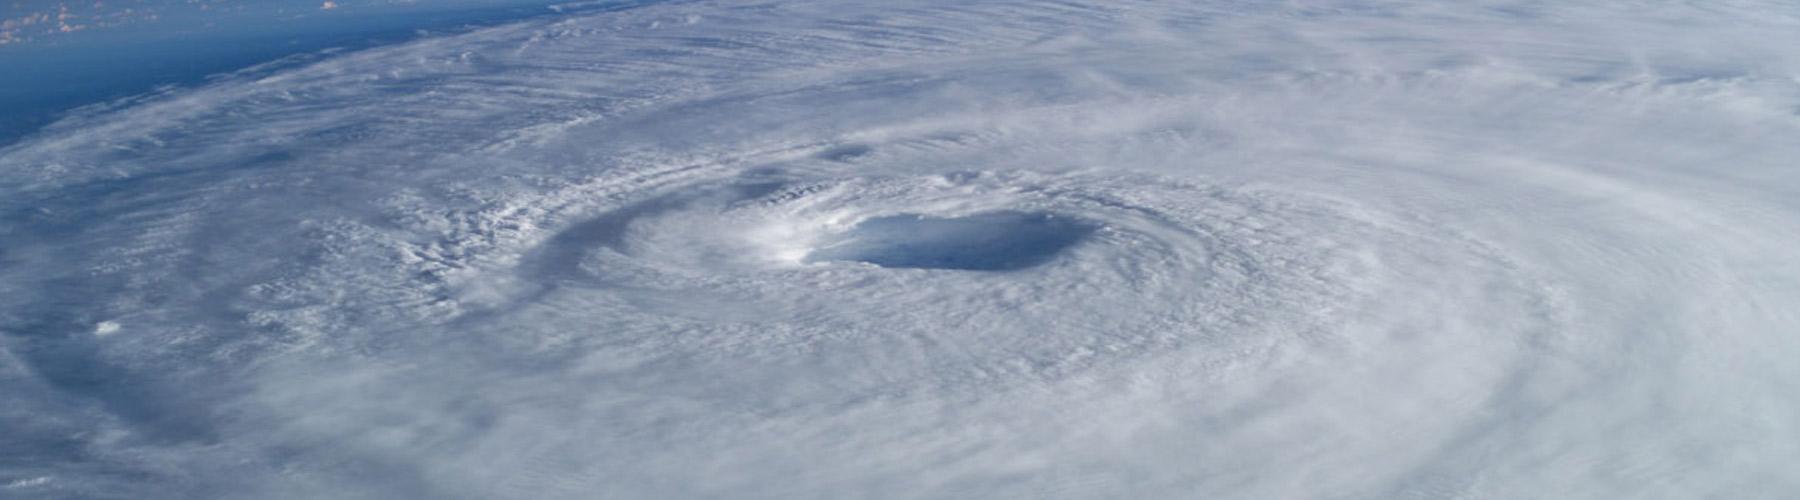 Hurricane & Weather Policies